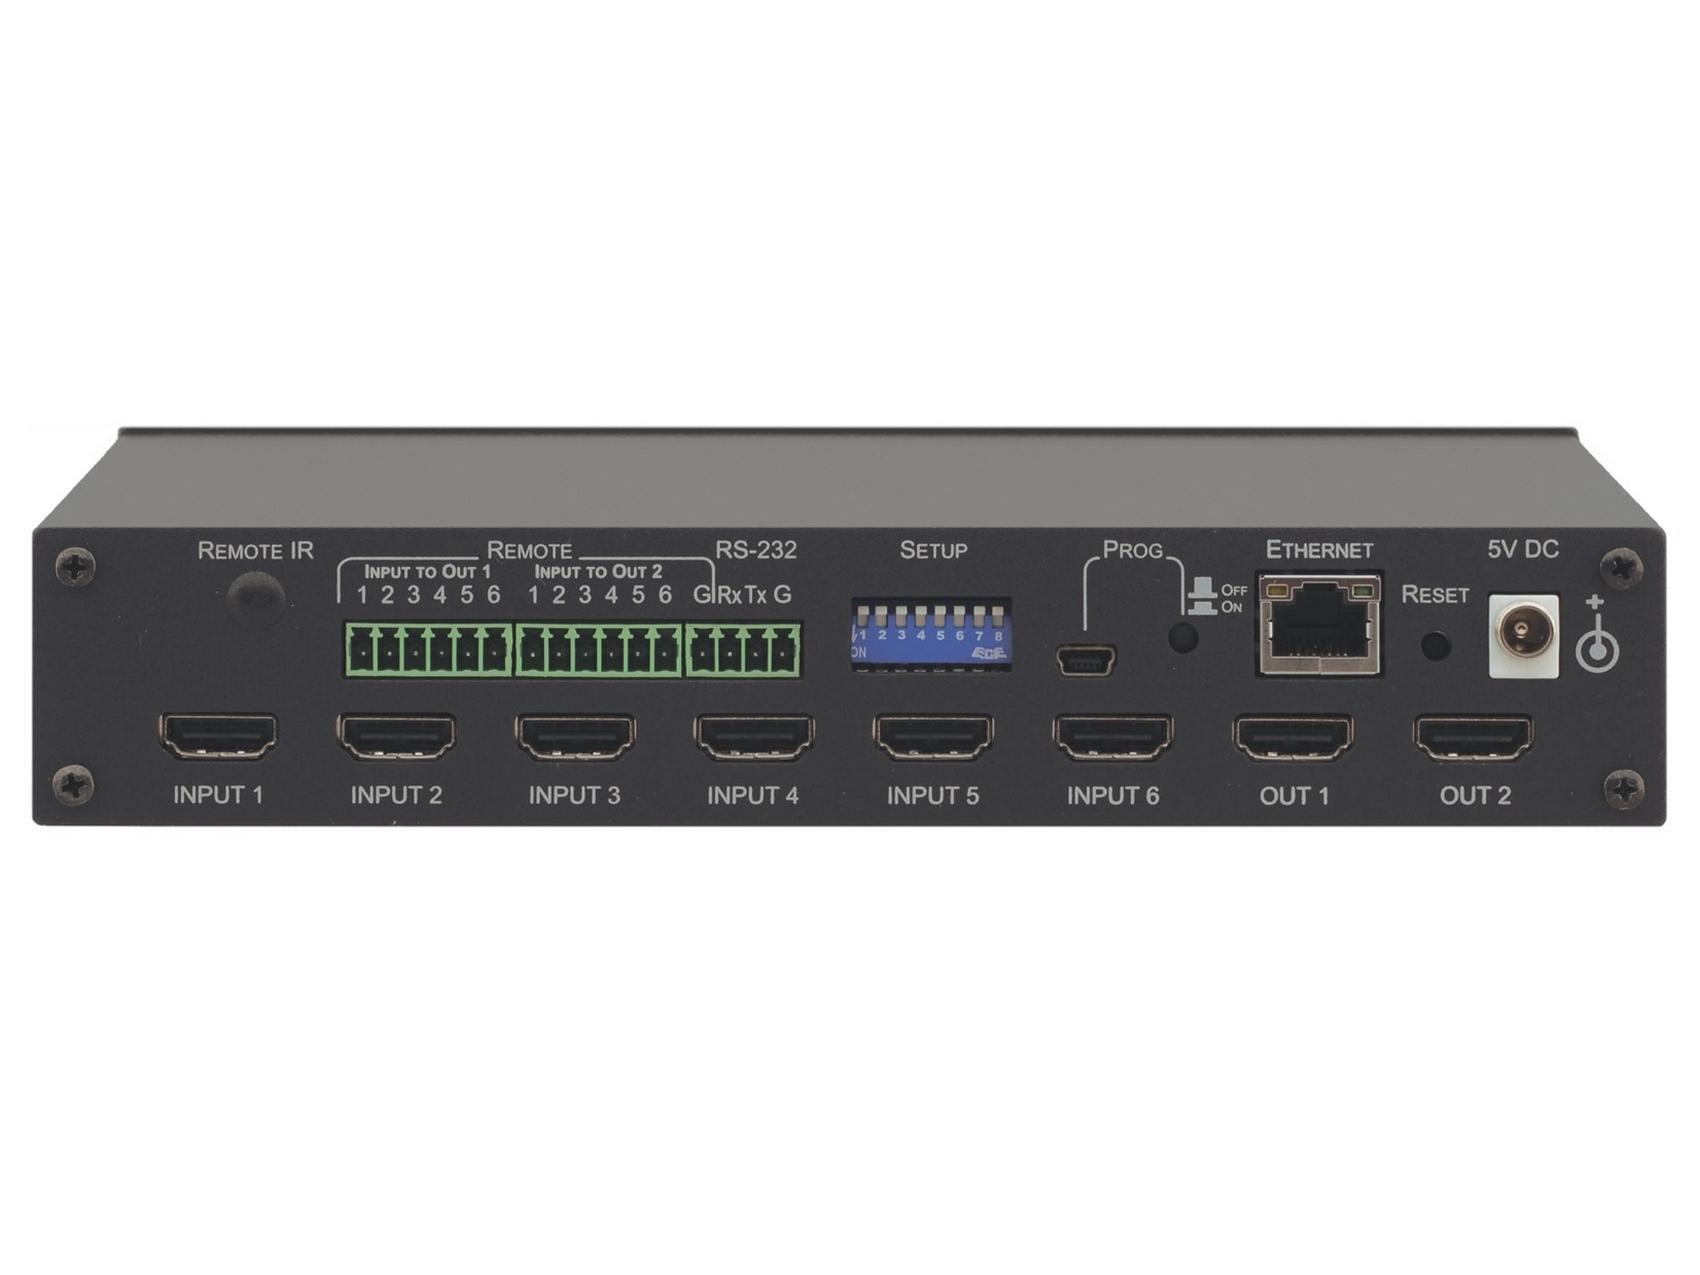 VS-62H 6x2 4K UHD HDMI HDTV/HDCP 3D Matrix Switcher by Kramer